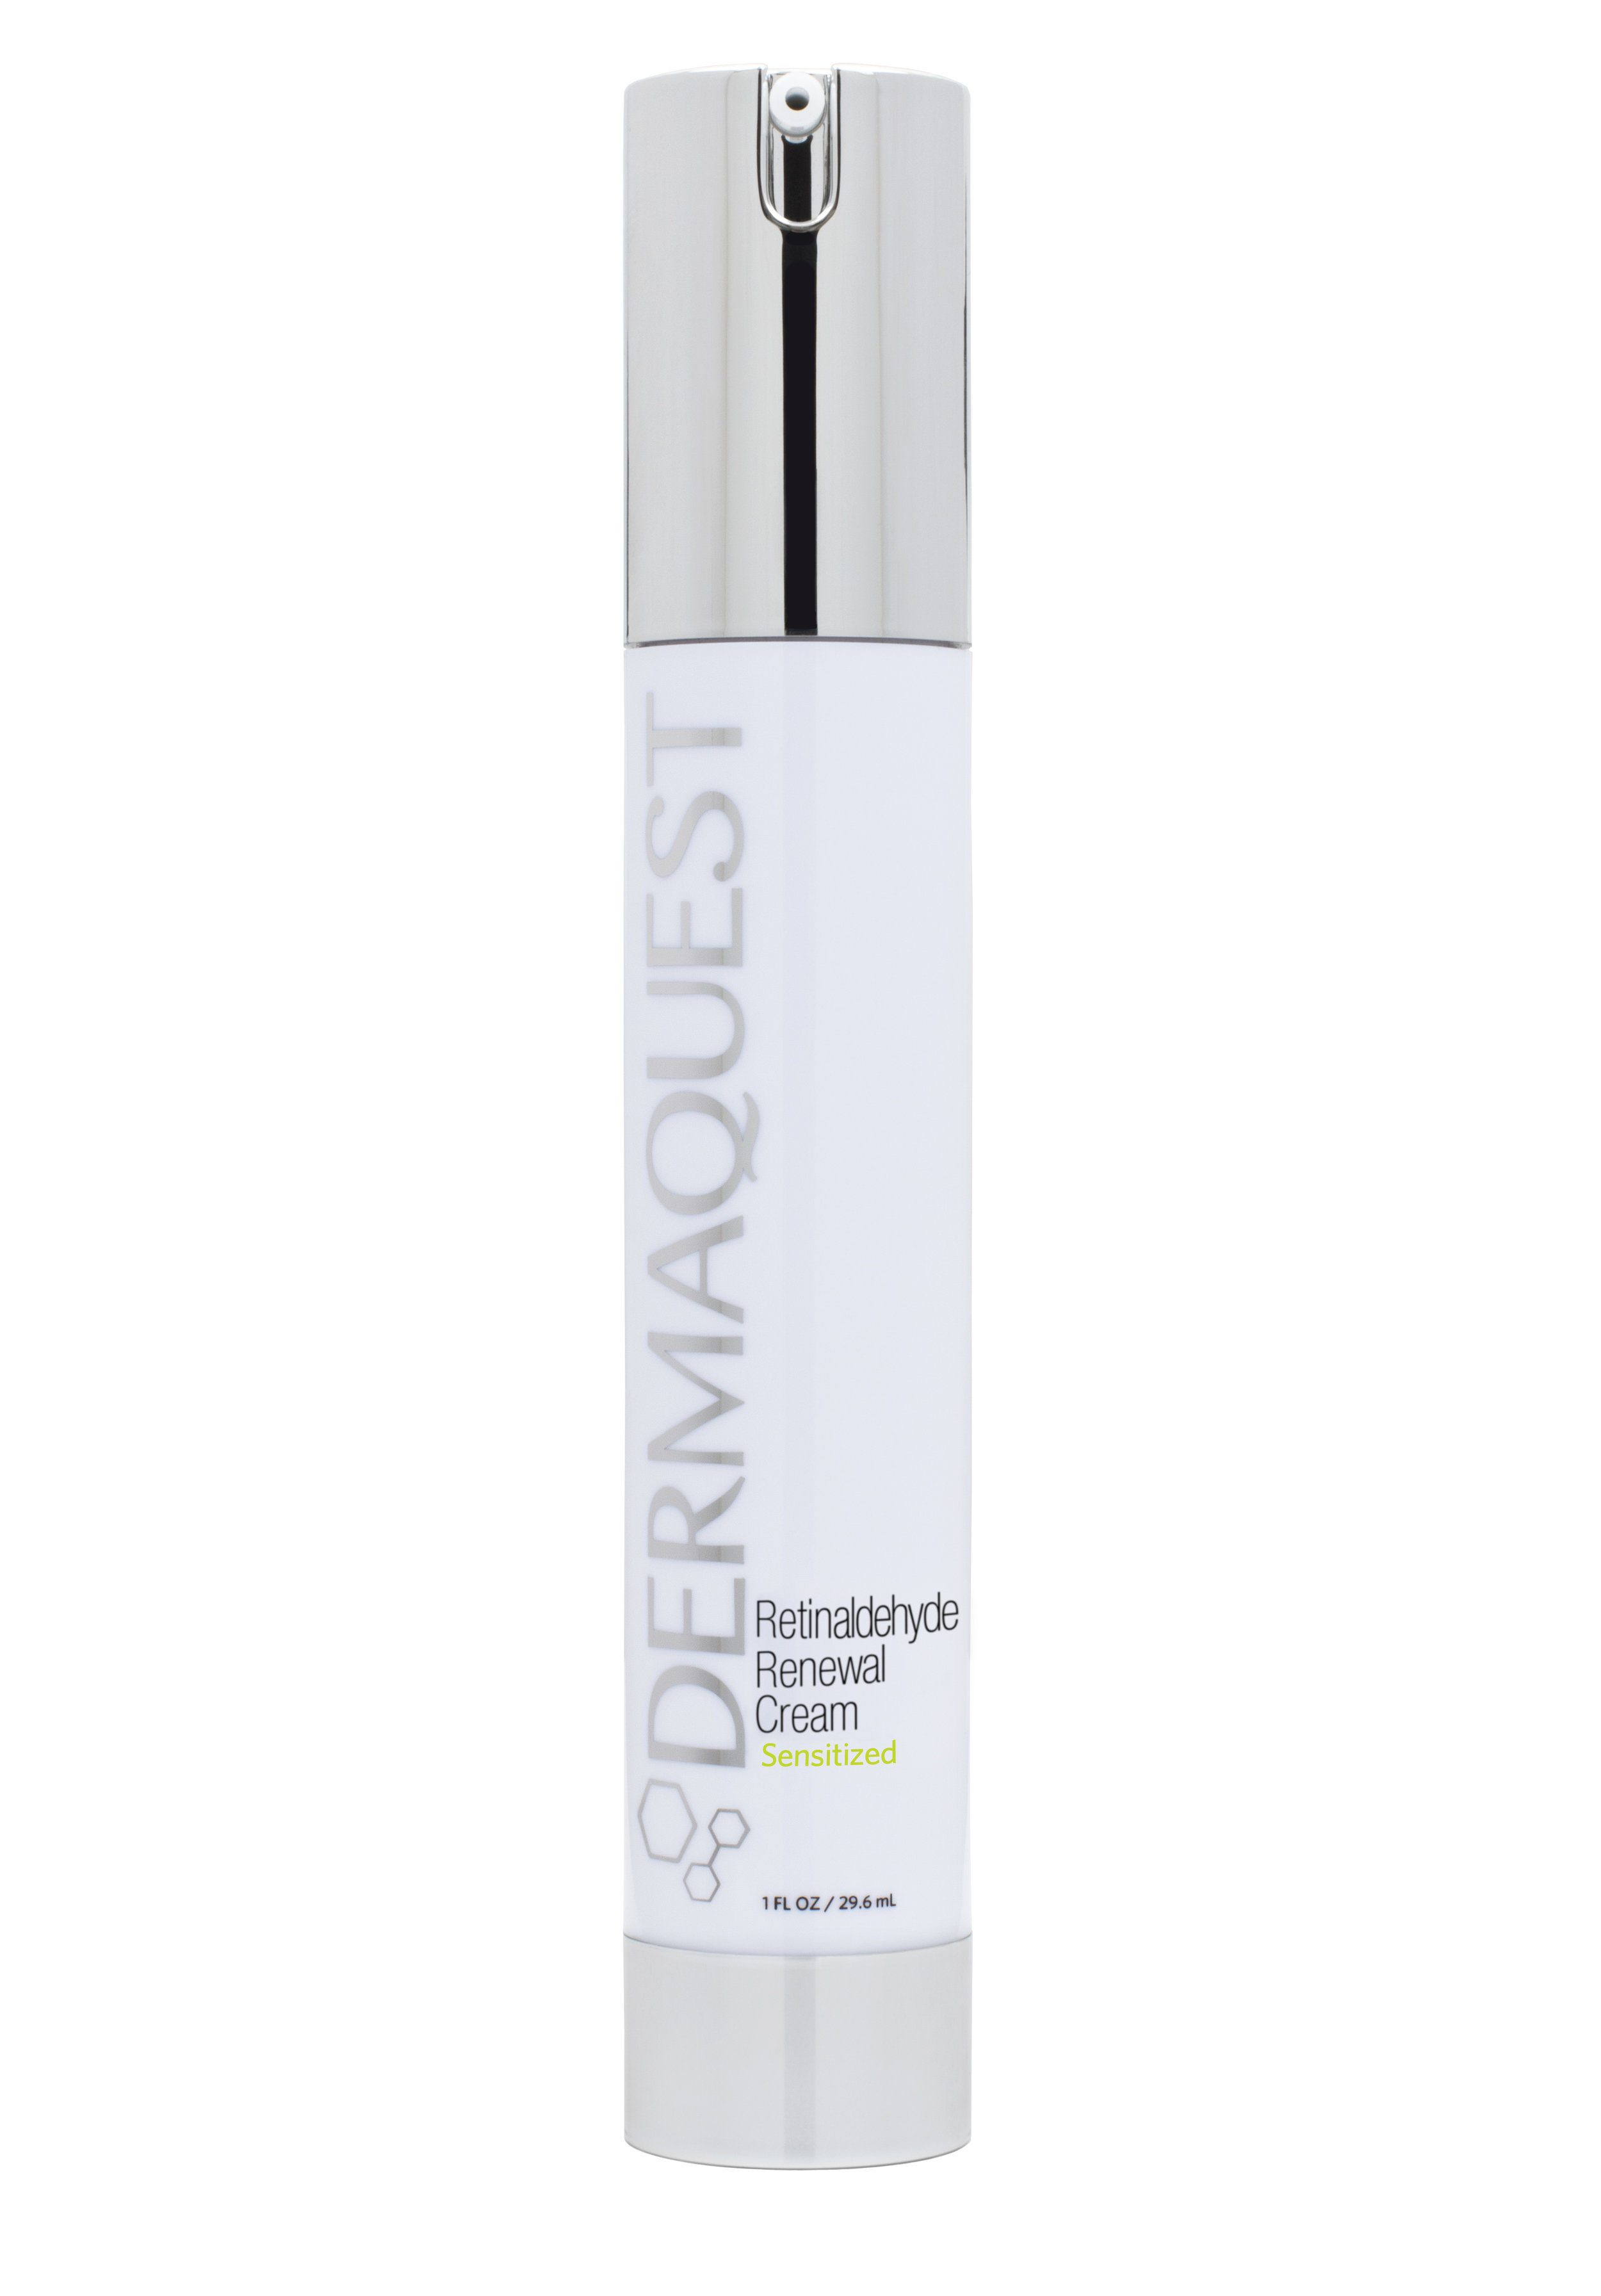 Sensitized_Retinaldehyde Renewal Cream 1oz-2.jpg